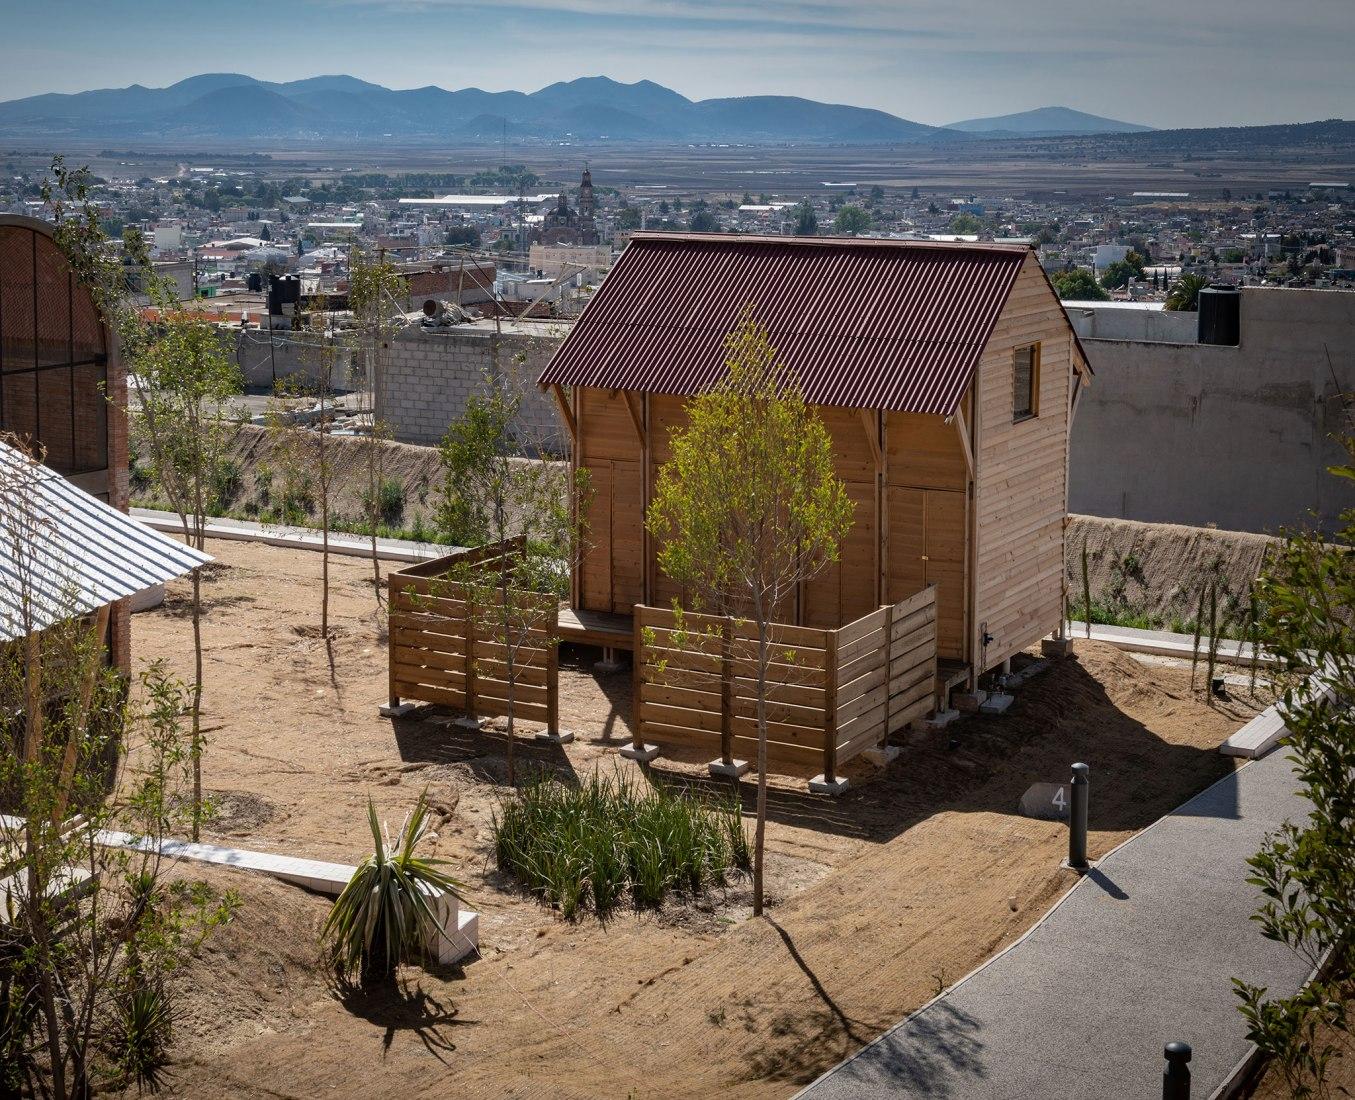 APAN housing prototype by Dellekamp + Schleich. Photograph Jaime Navarro.